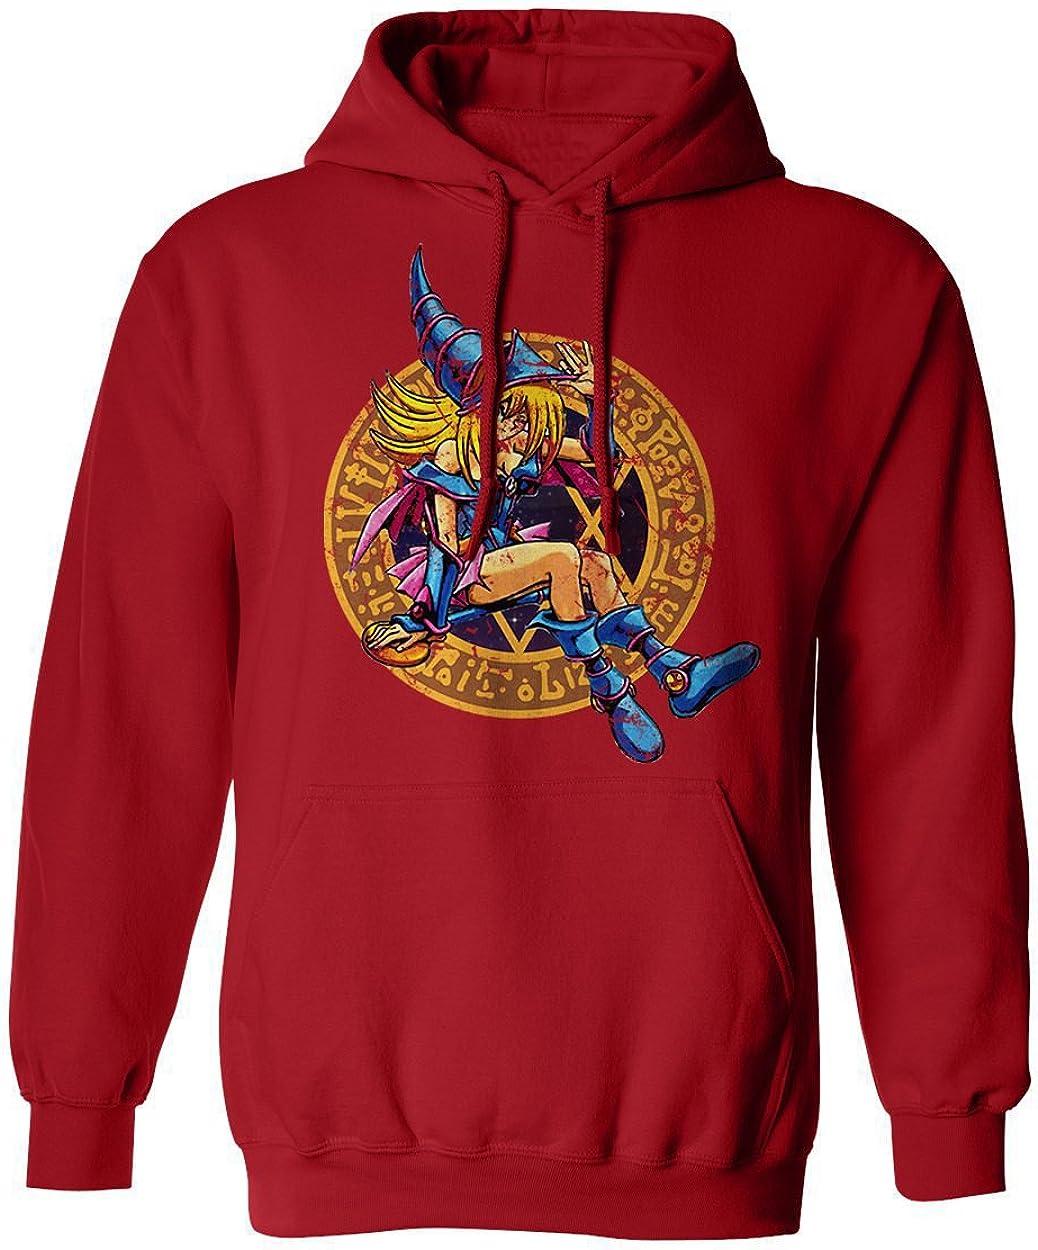 RIVEBELLA New Novelty Tee Dark Magician female Mens Hoodie Hooded Sweatshirt